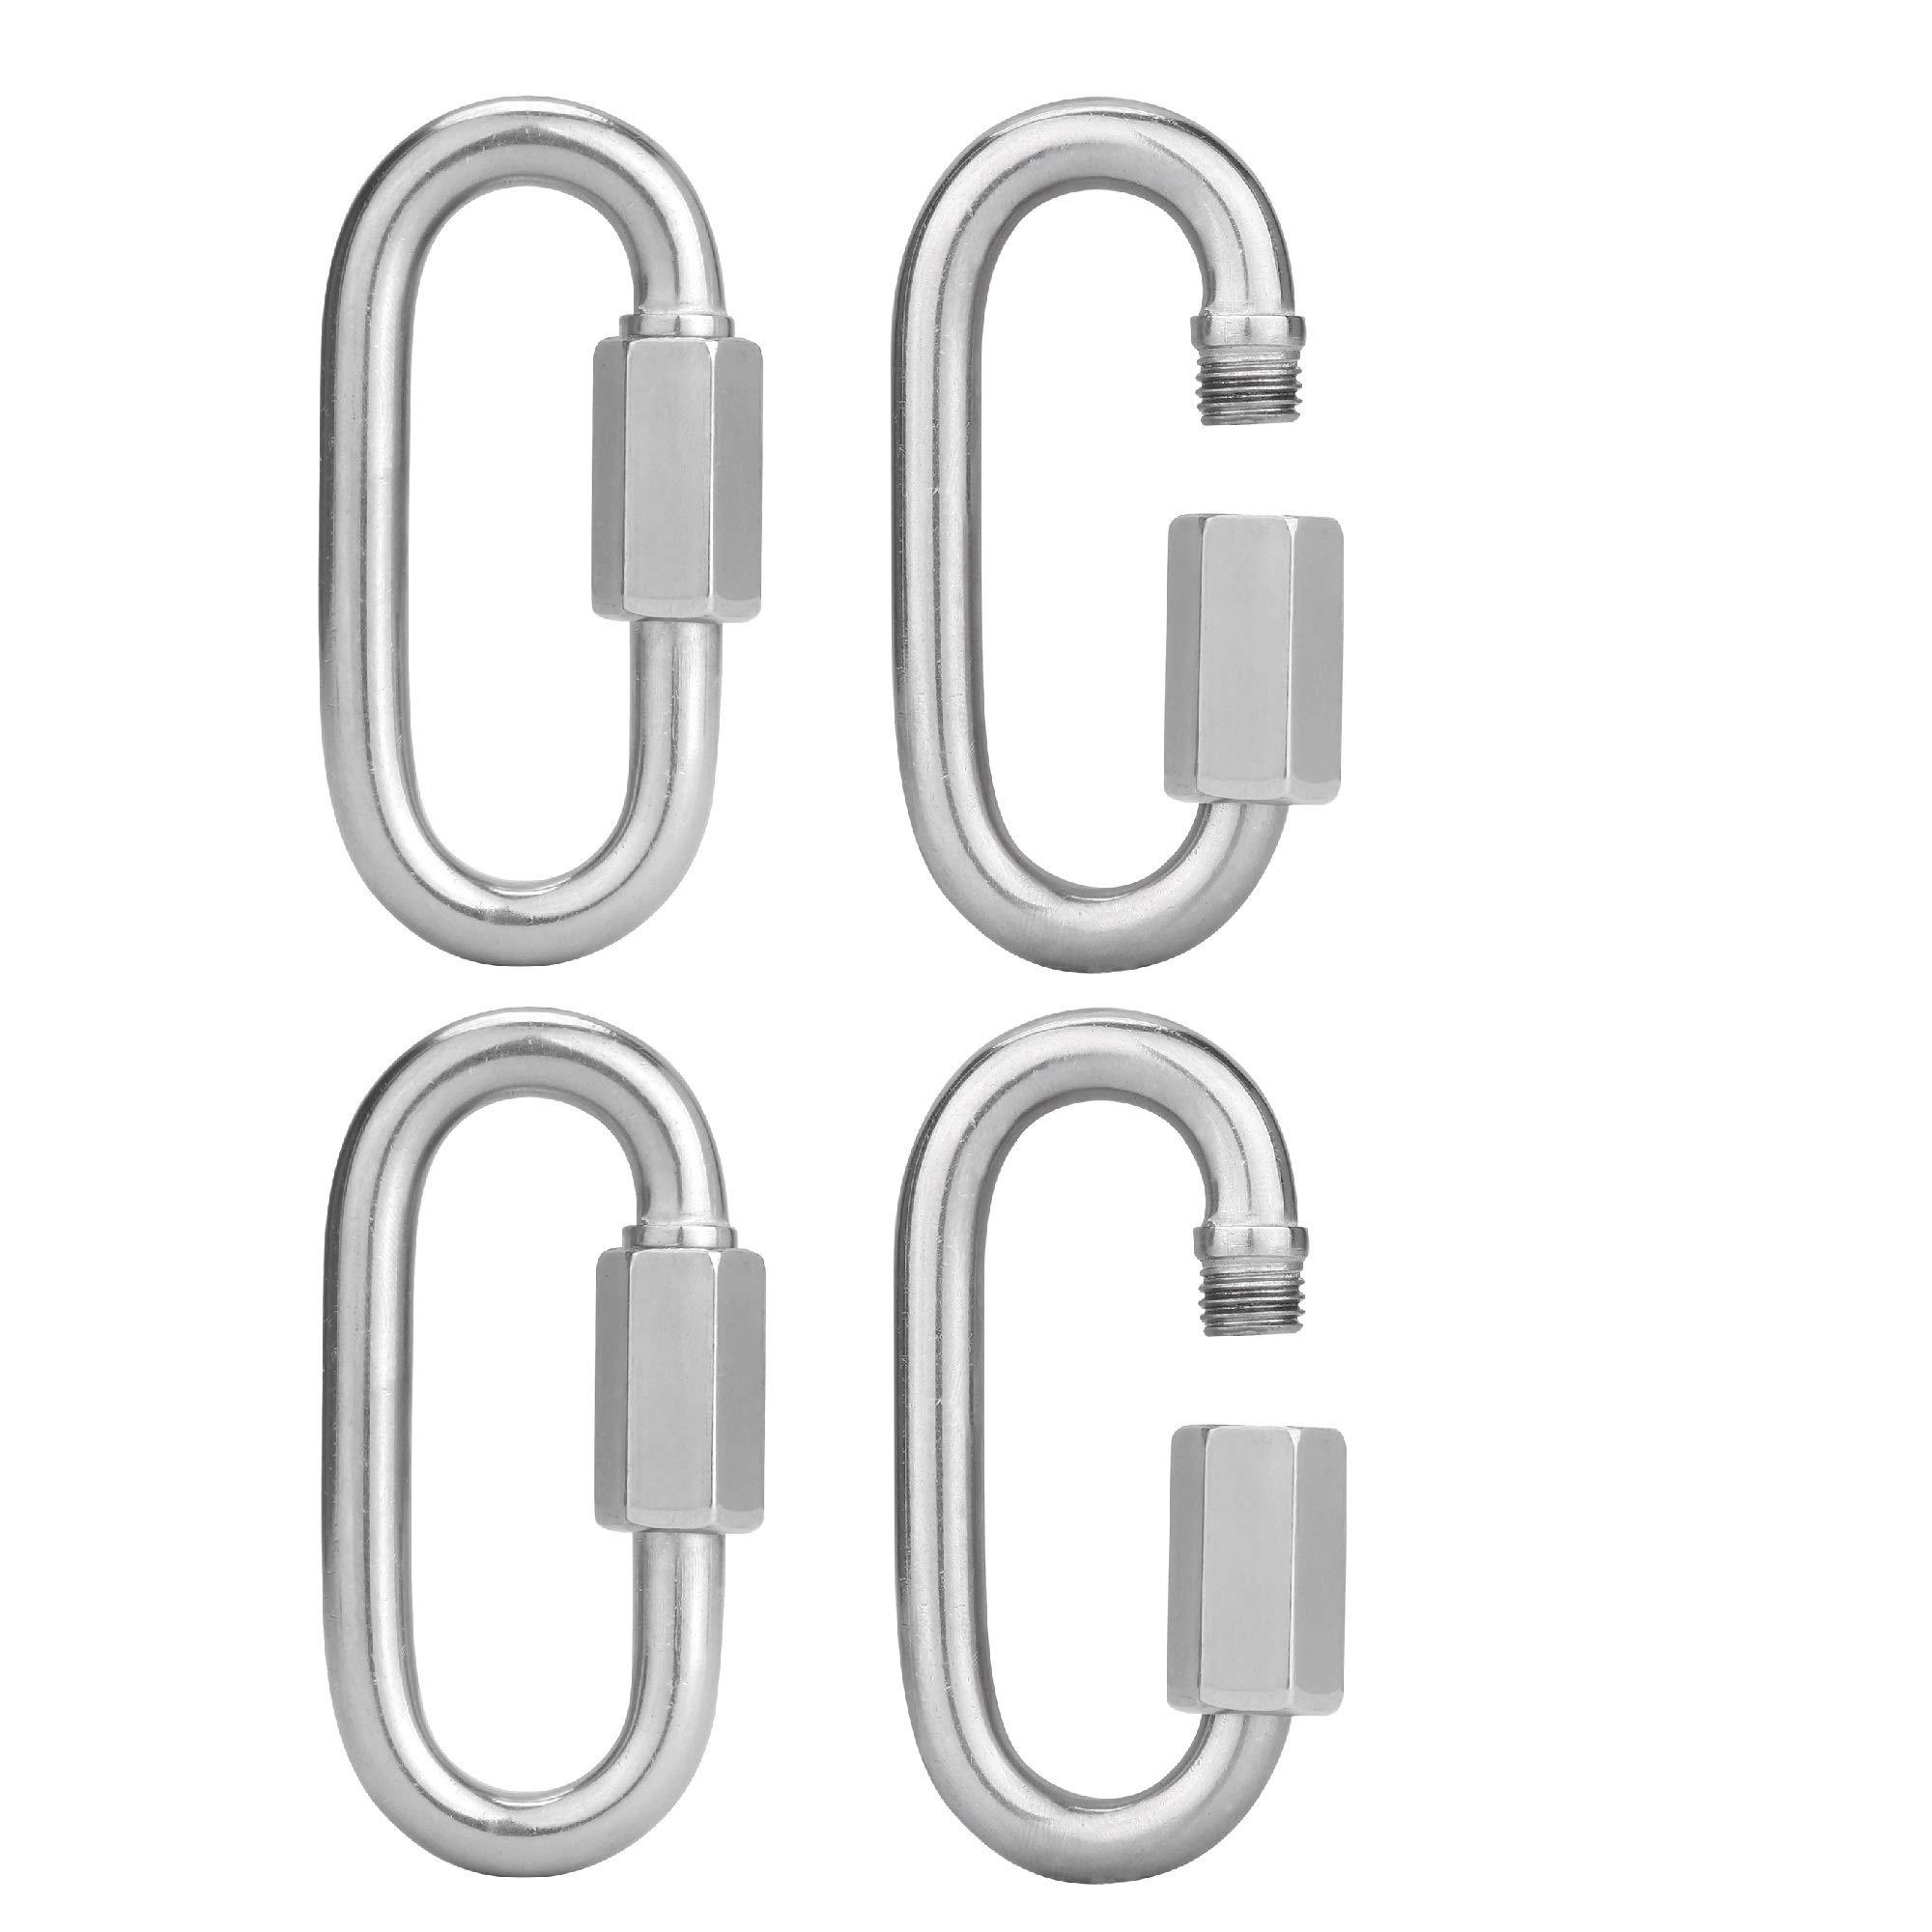 Anndason 4 Pcs M8/0.32'' 304 Stainless Steel D Shape Quick Link C1arabiner Lock Ring 691KG 1523LB by Anndason